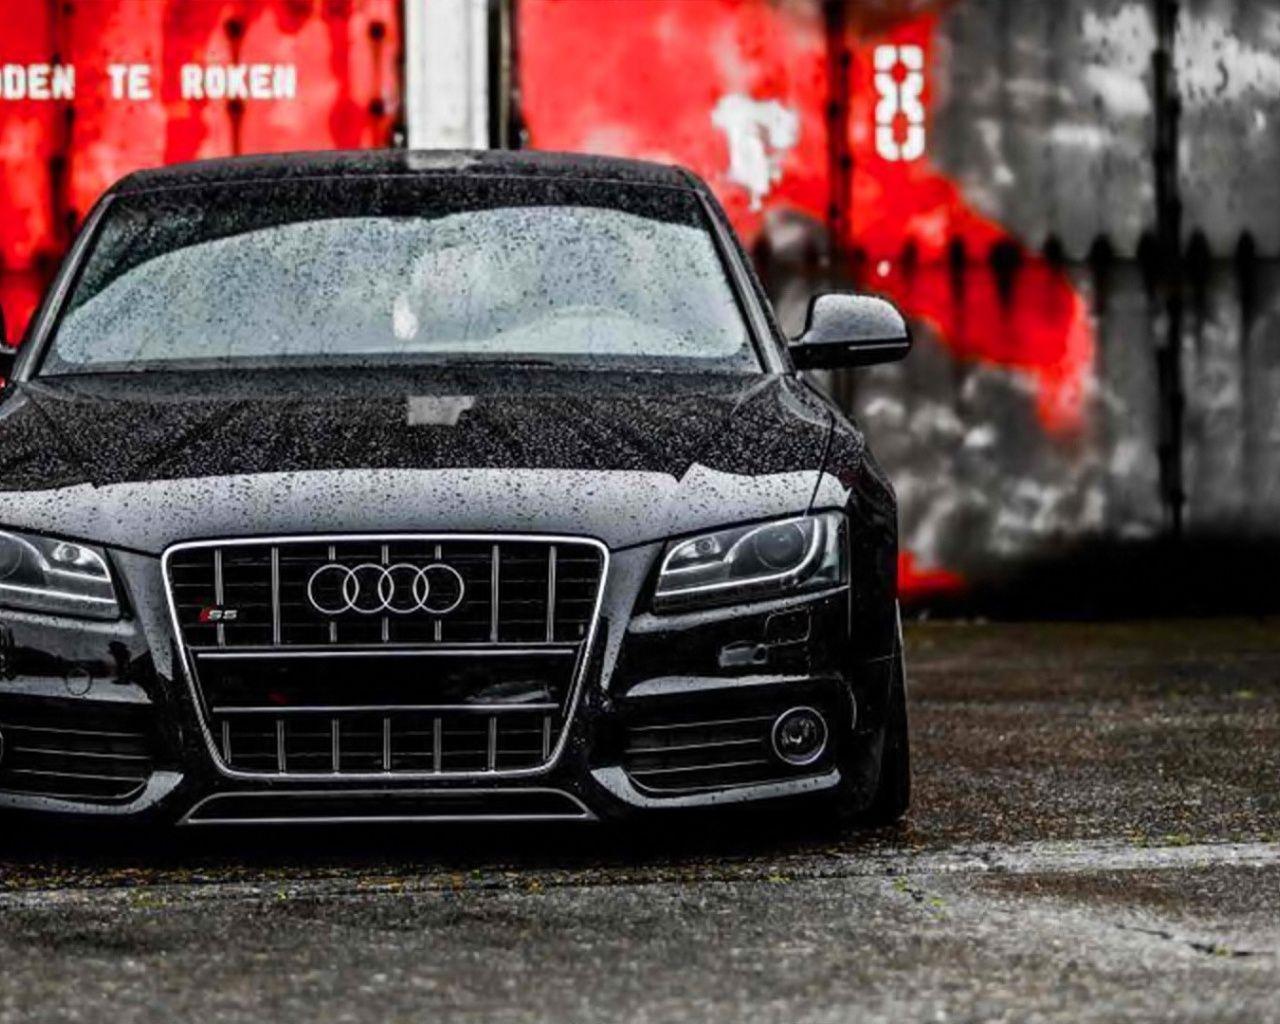 Vorsteiner Audi S Front View Wallpaper Car Wallpapers HD - Audi worldwide